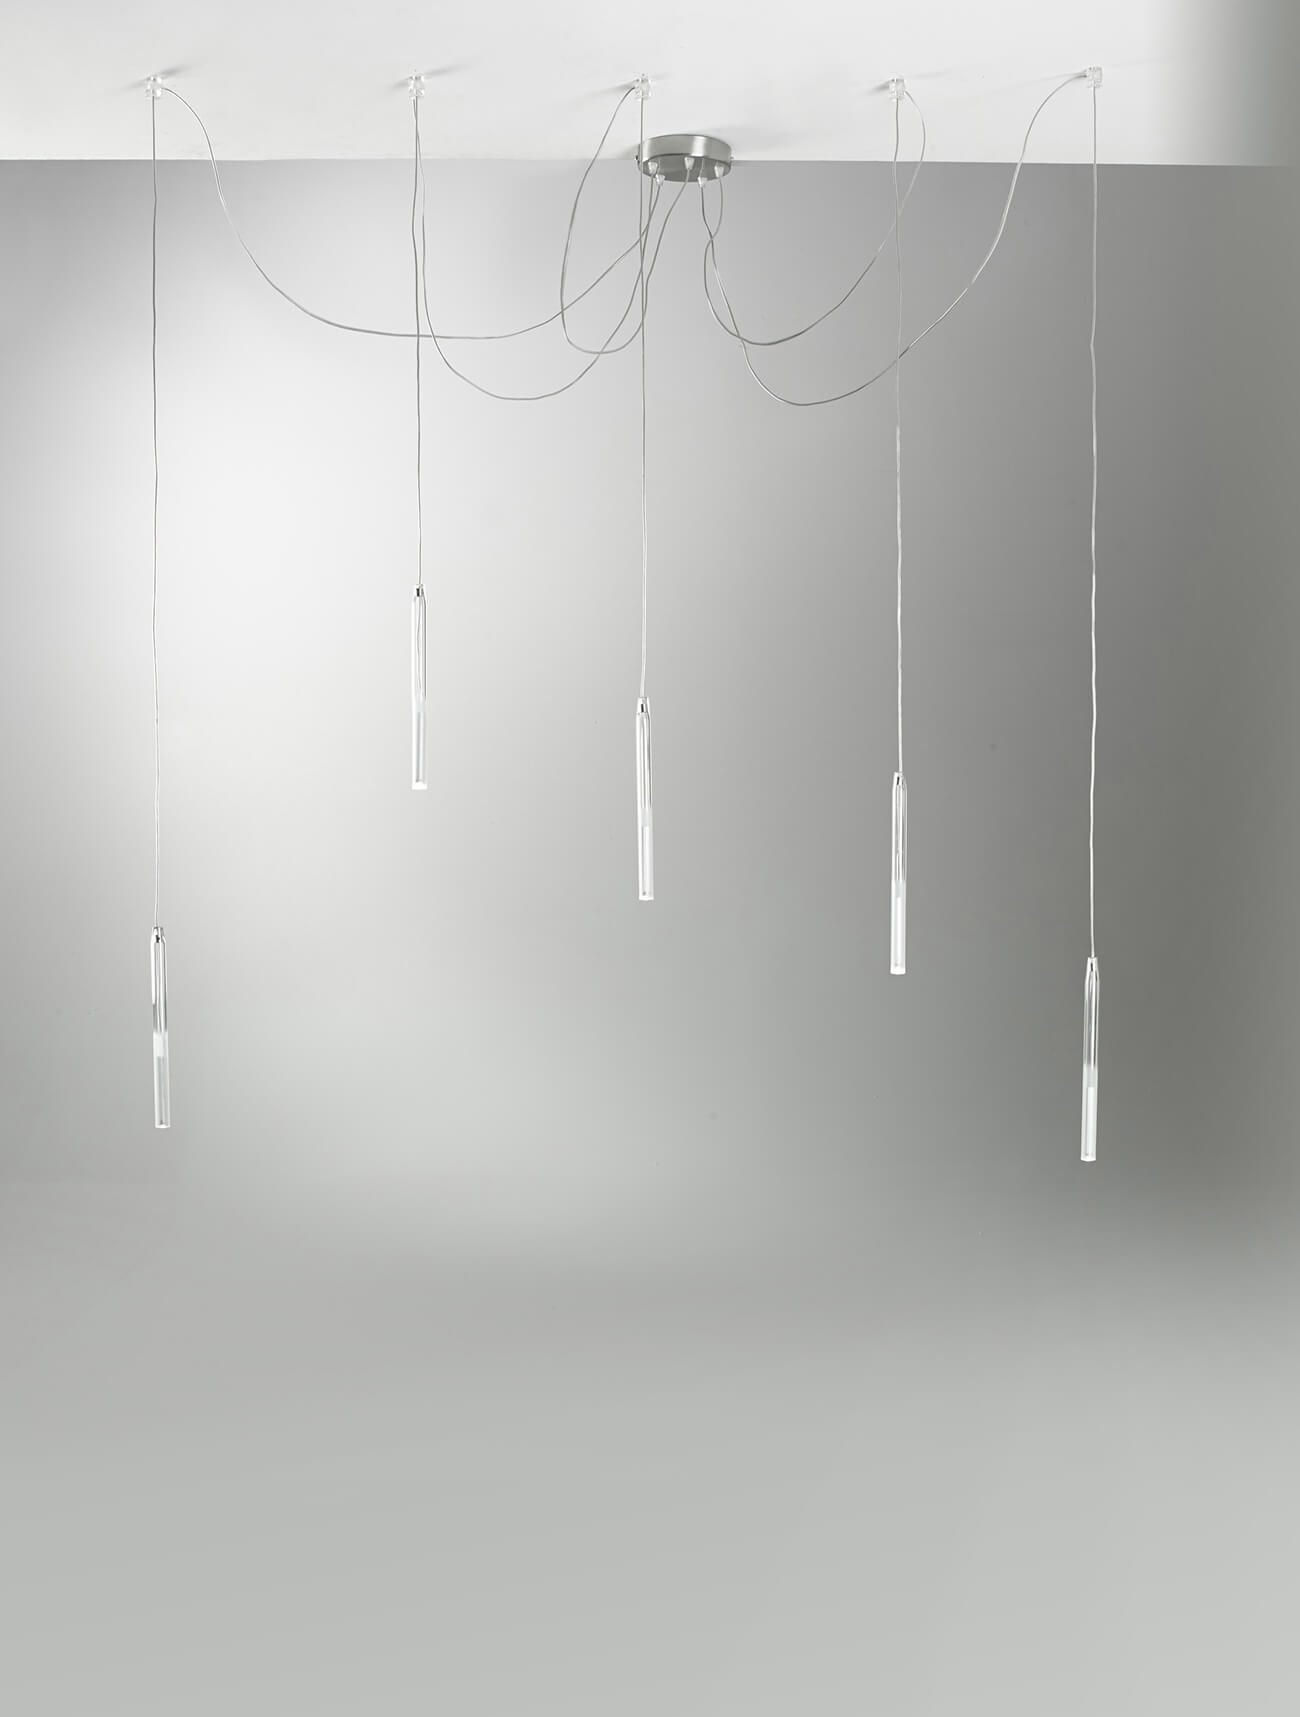 waterfalls-still-02